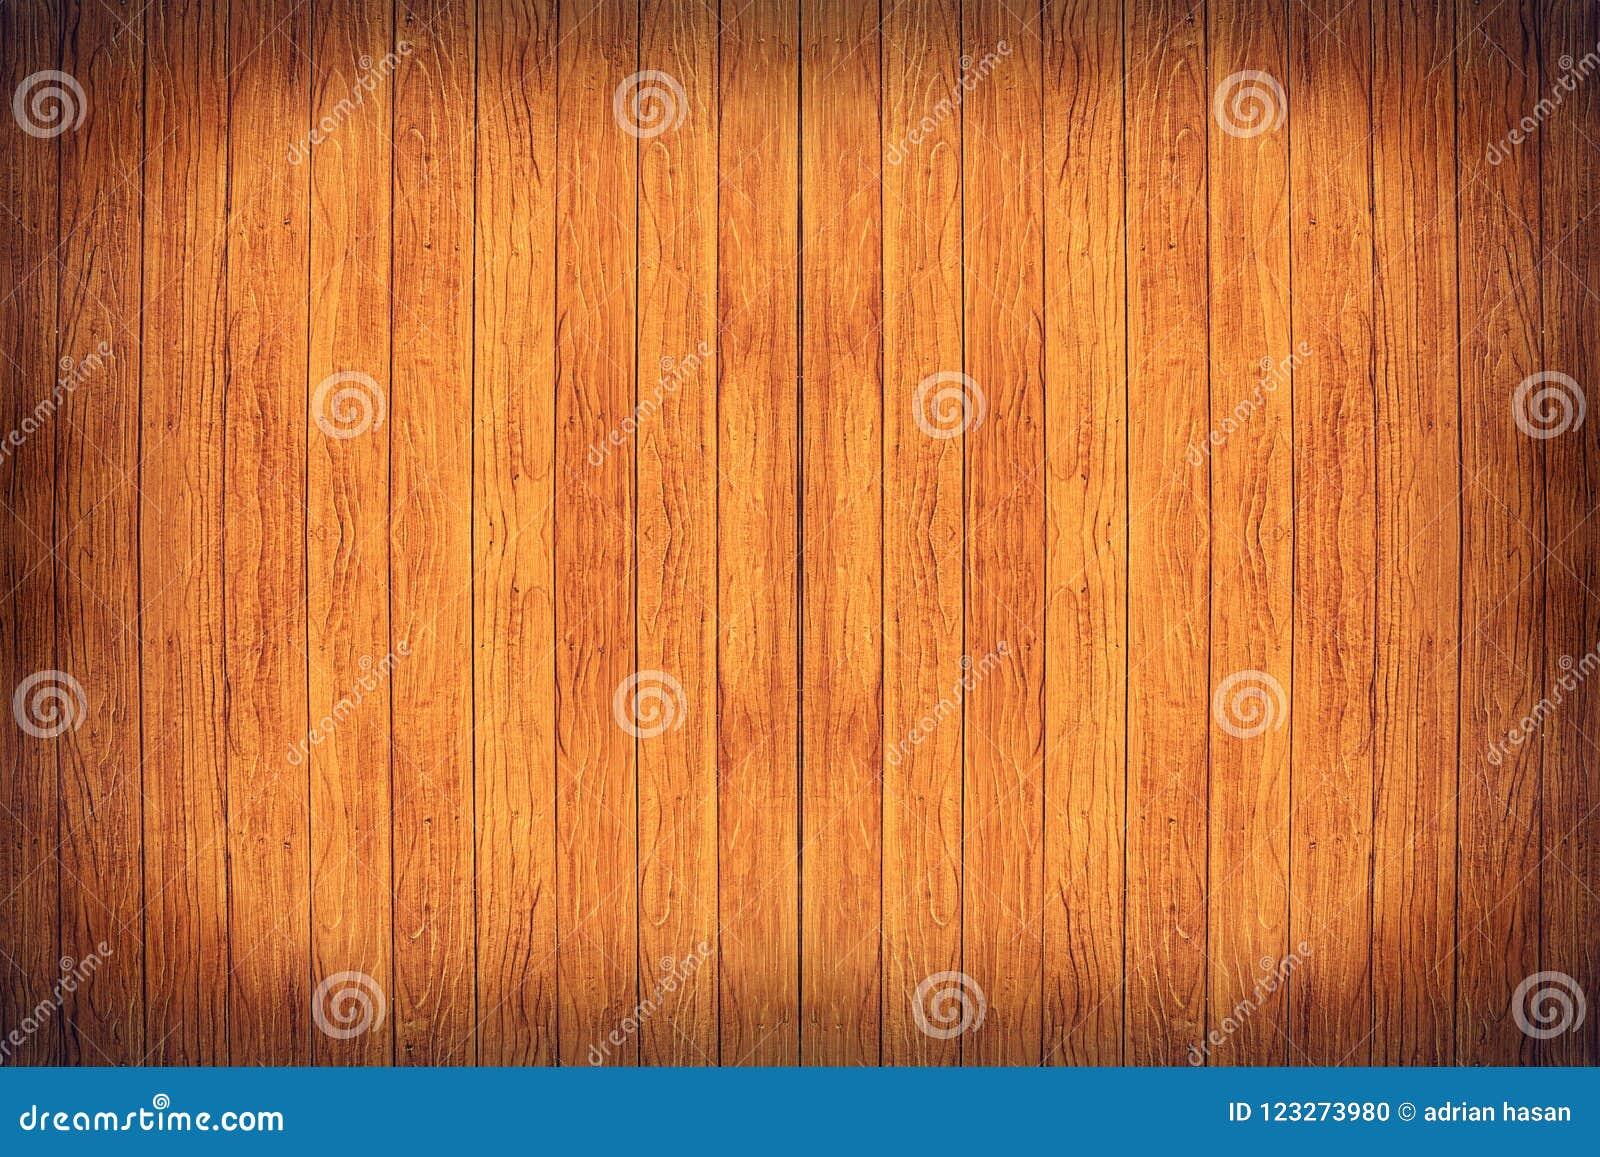 Wood Background wallpaper HD